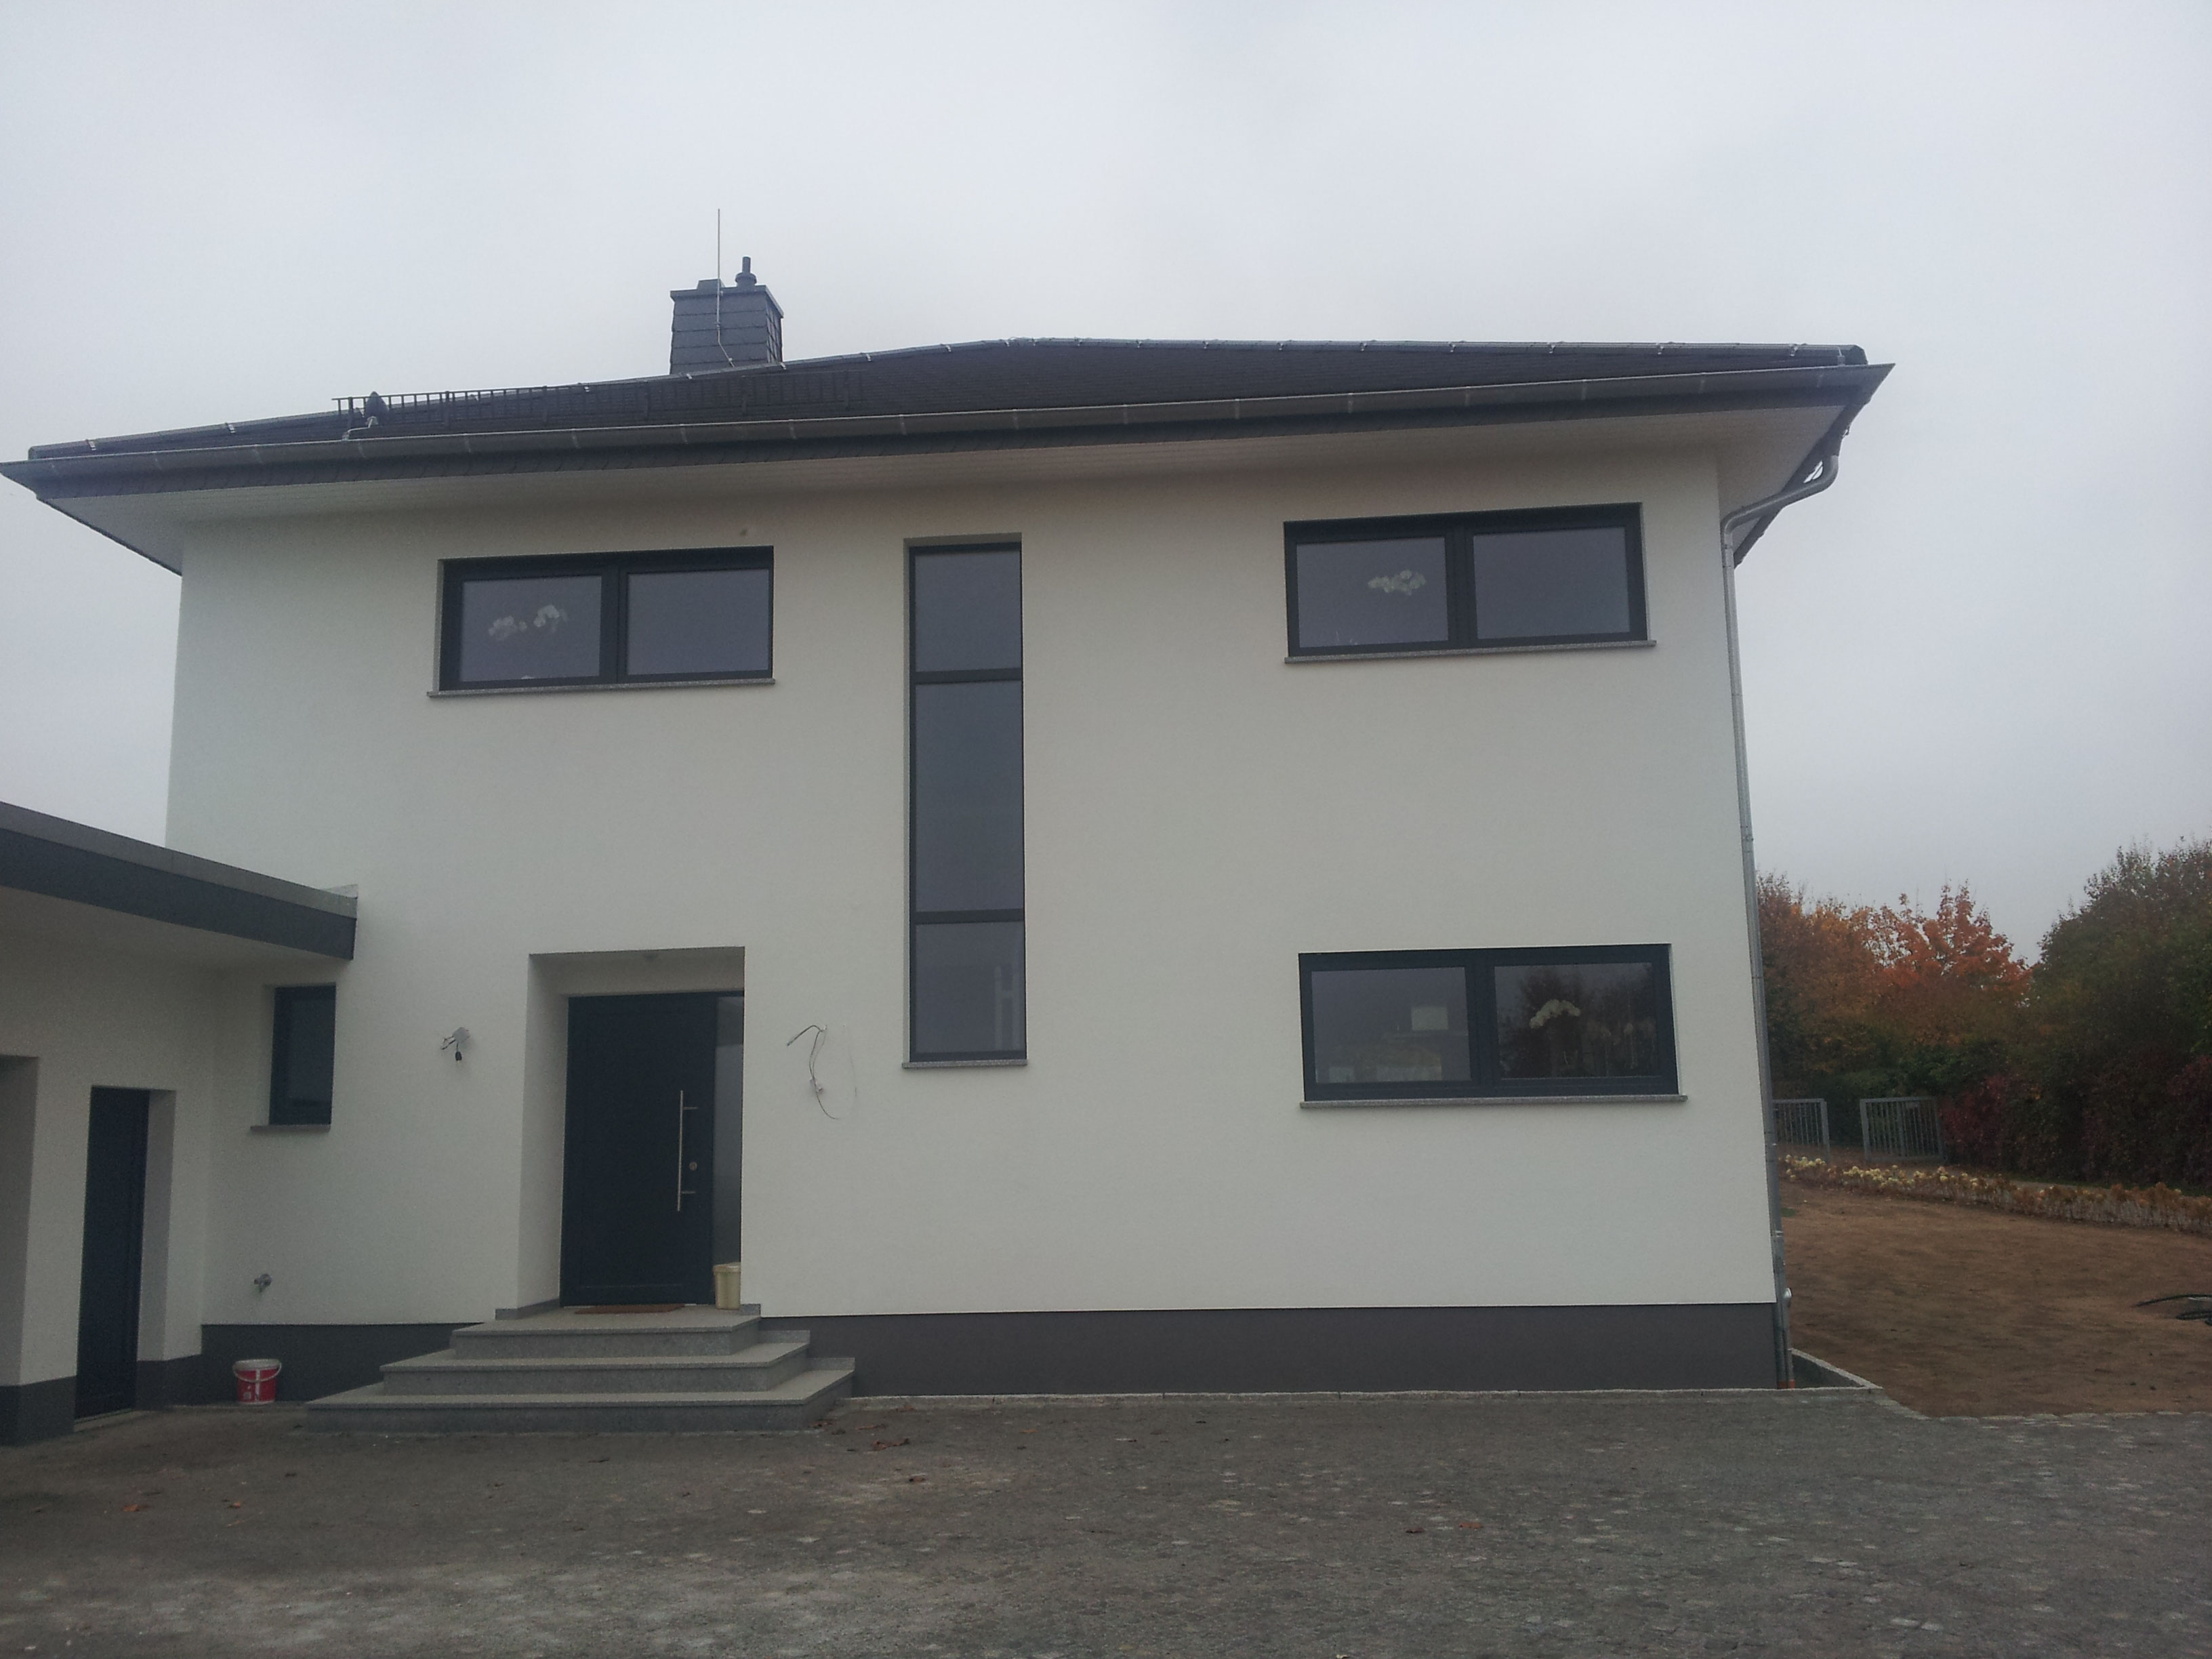 Charmant Neubau U2013 Einfamilienhaus U2013 Bautzen. SmannFront Frontsmann1 FrontSämann2